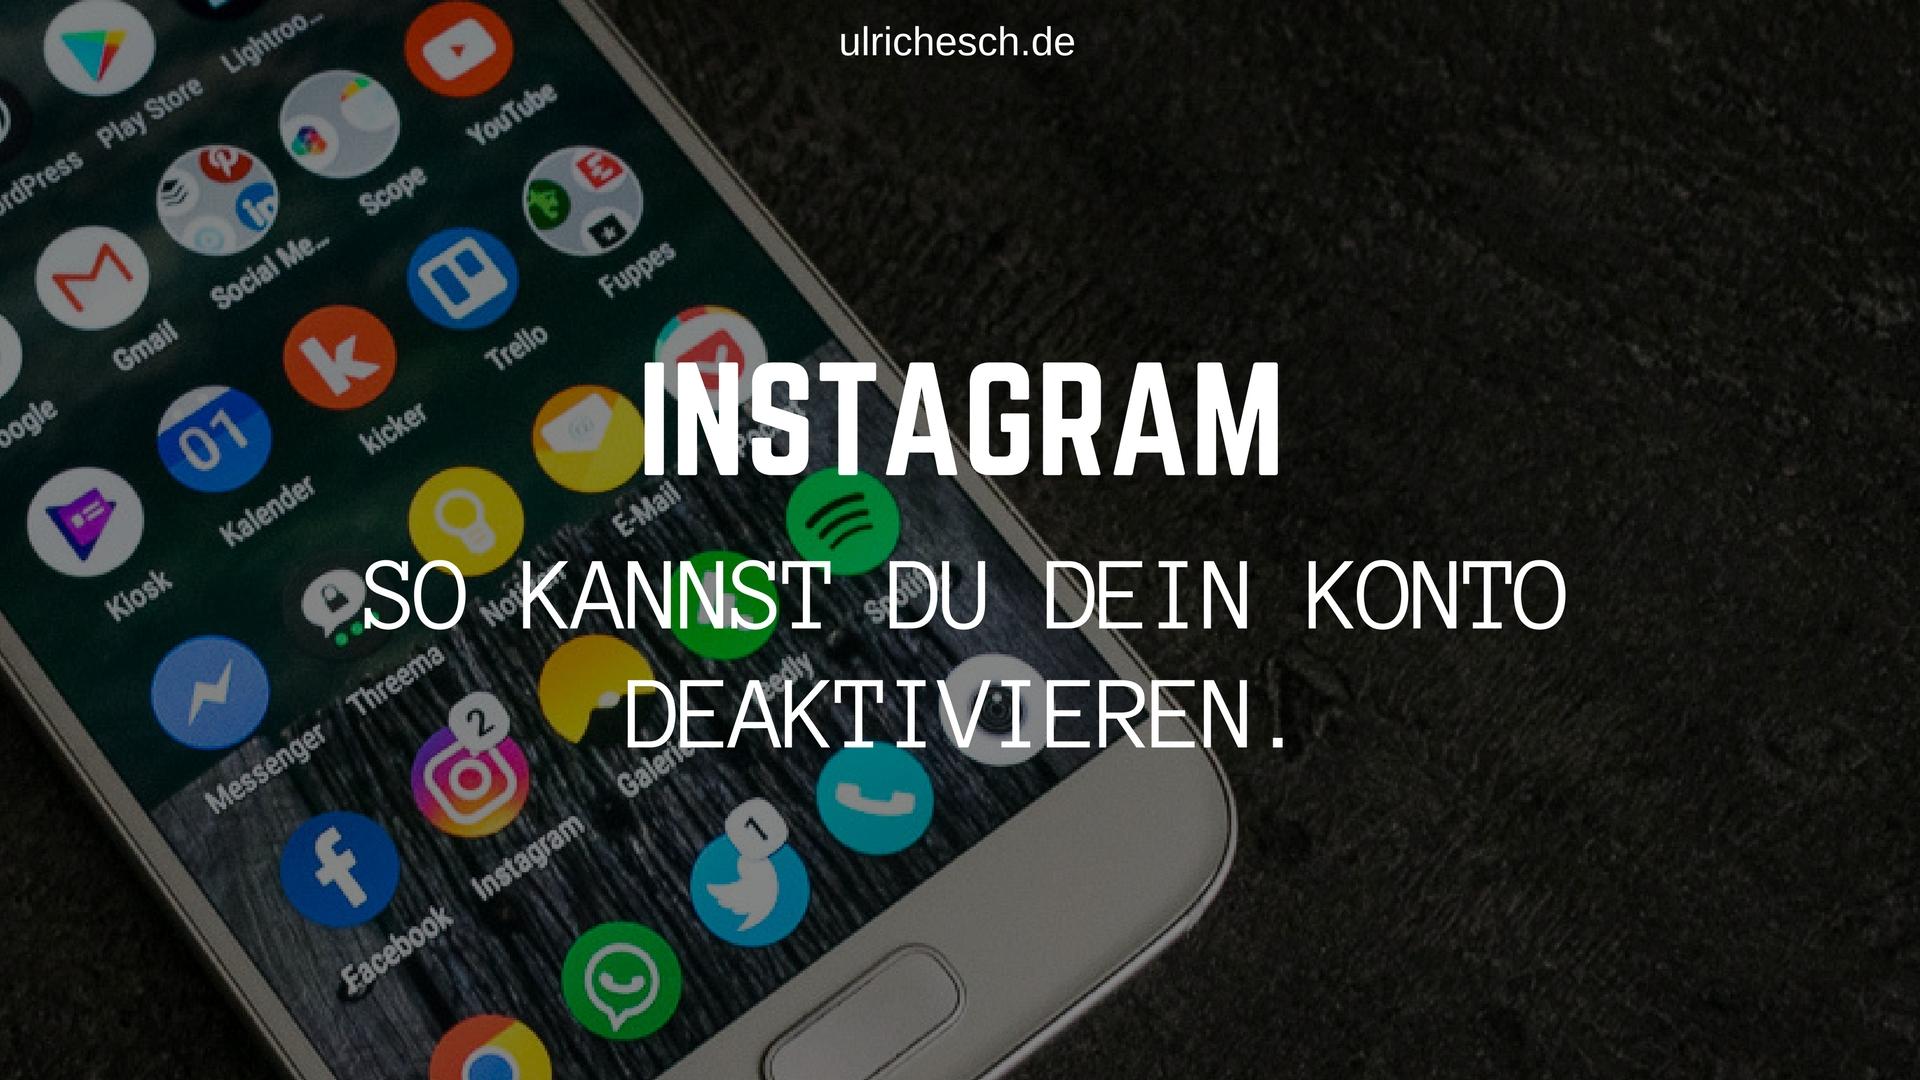 konto deaktivieren instagram